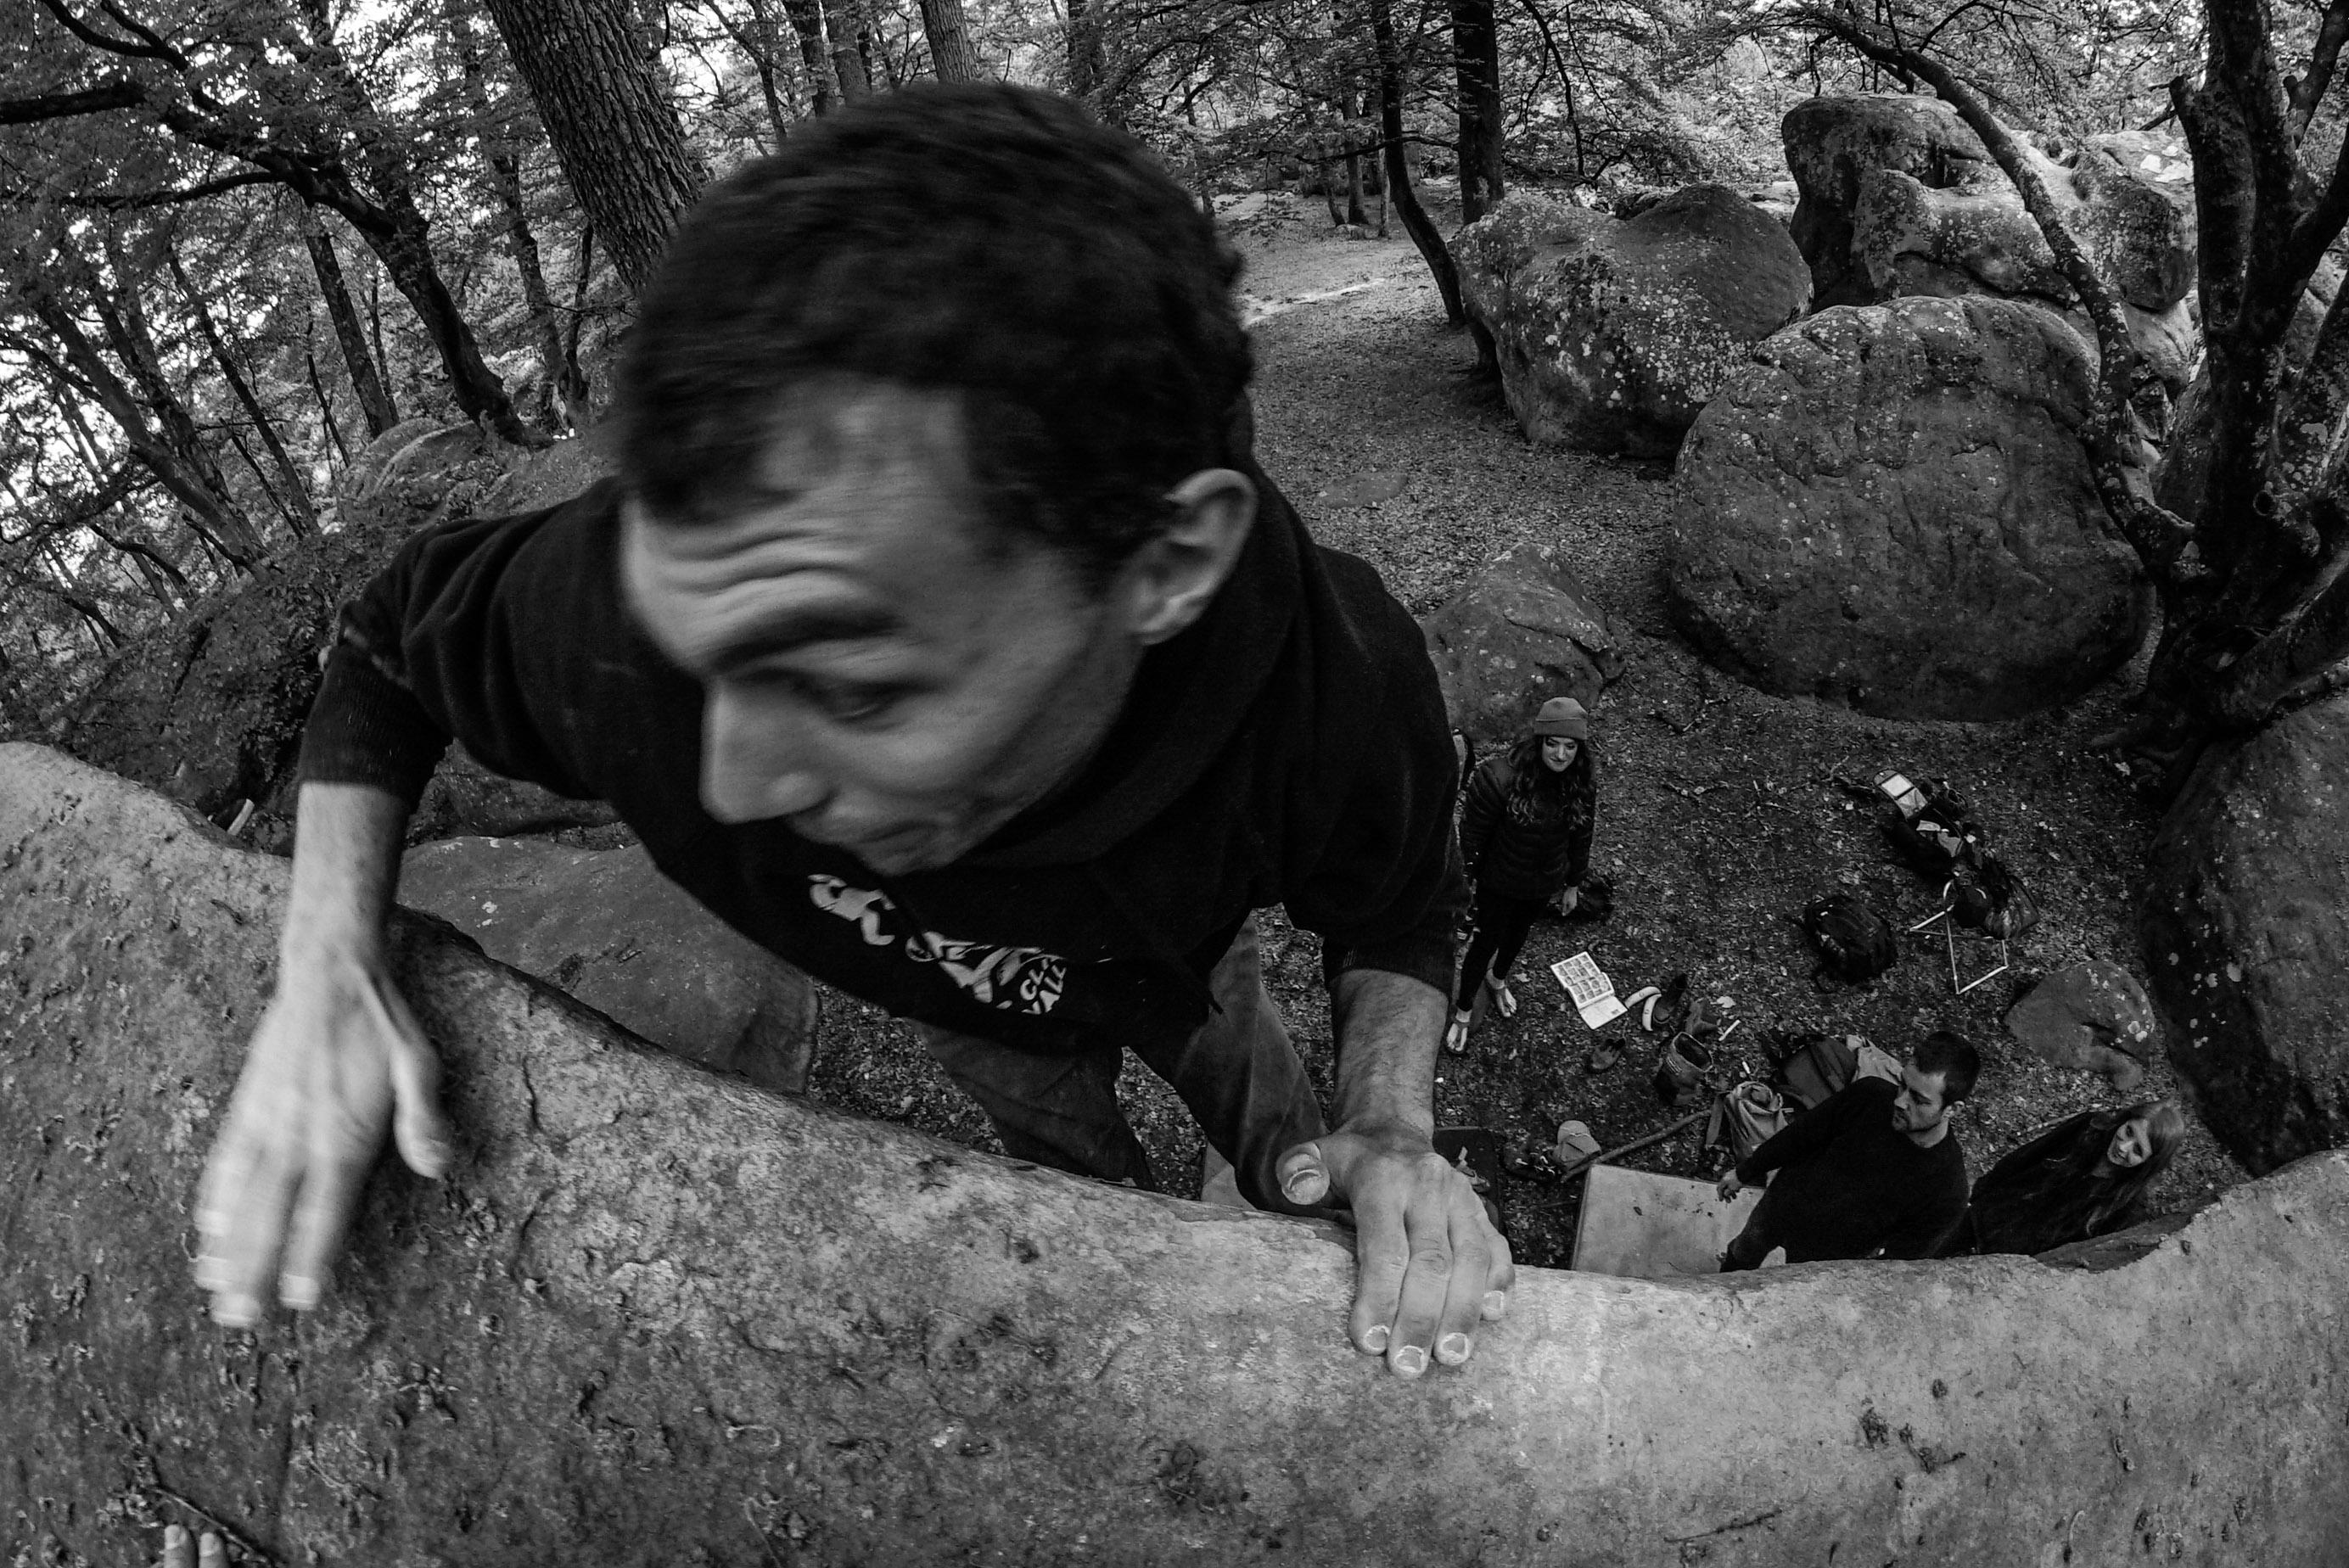 fontainbleau climbing 2016 mike brindley-102